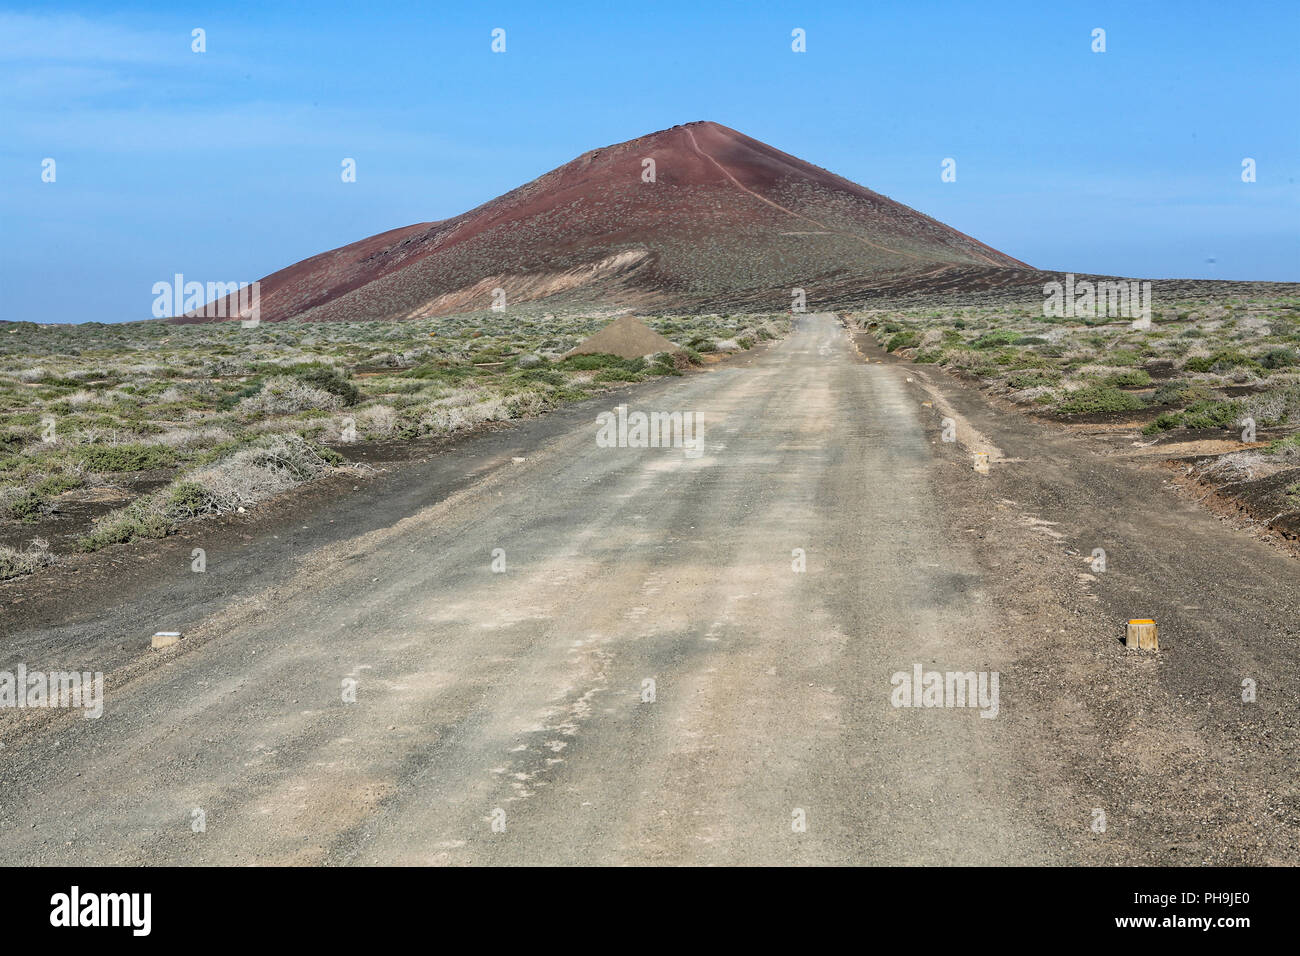 volcano at isla graciosa canarias - Stock Image